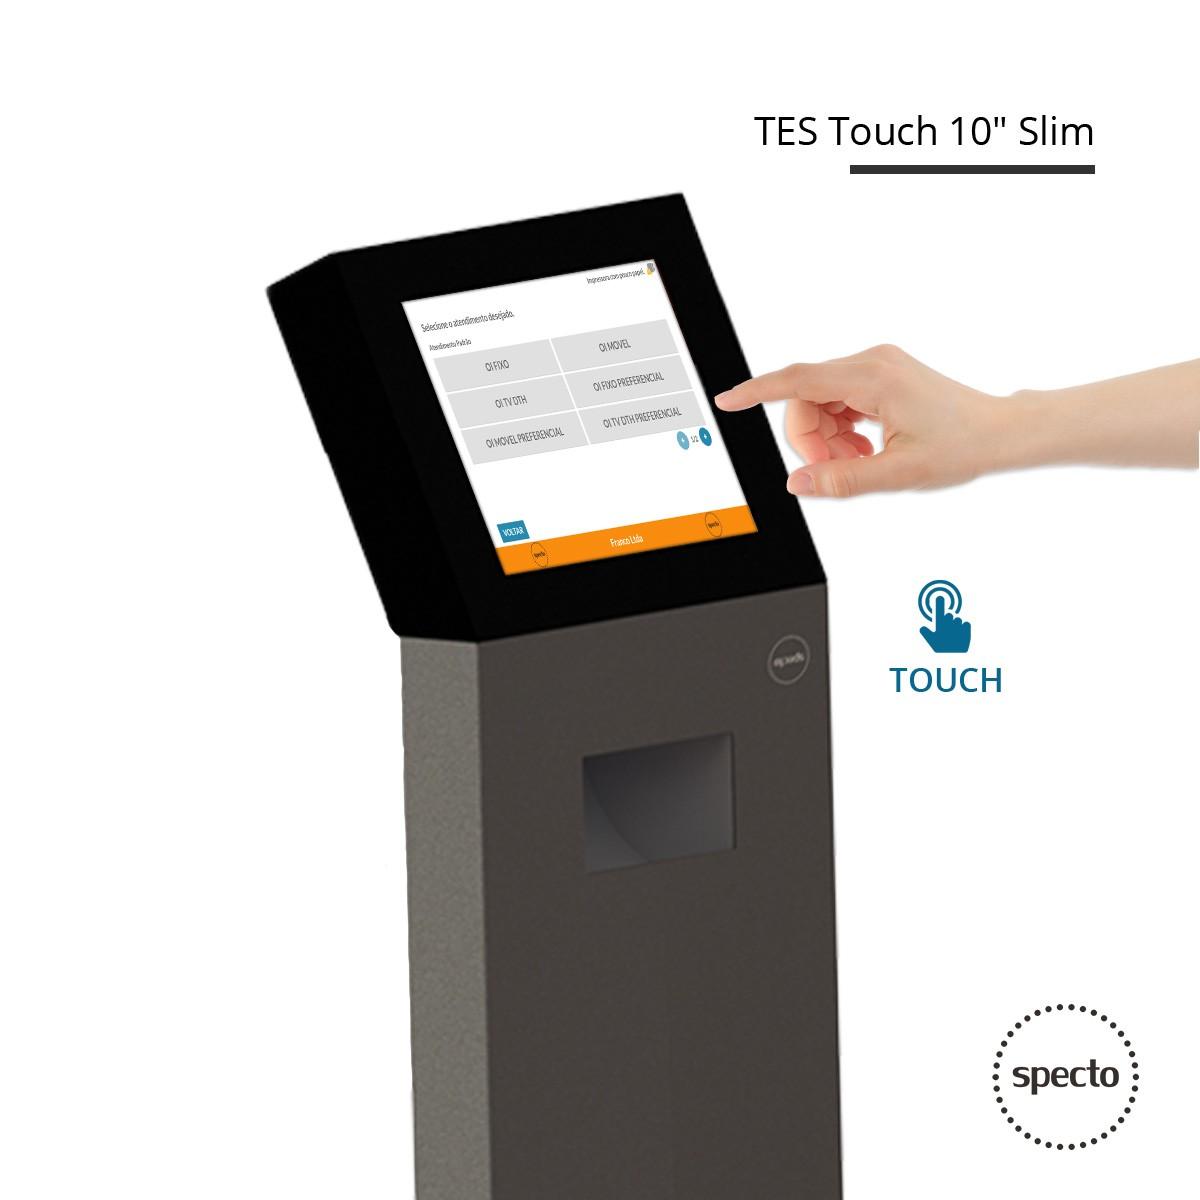 QUALPROX® UNITY TV Digital + Corporativa com TES Touch  -  Specto Tecnologia